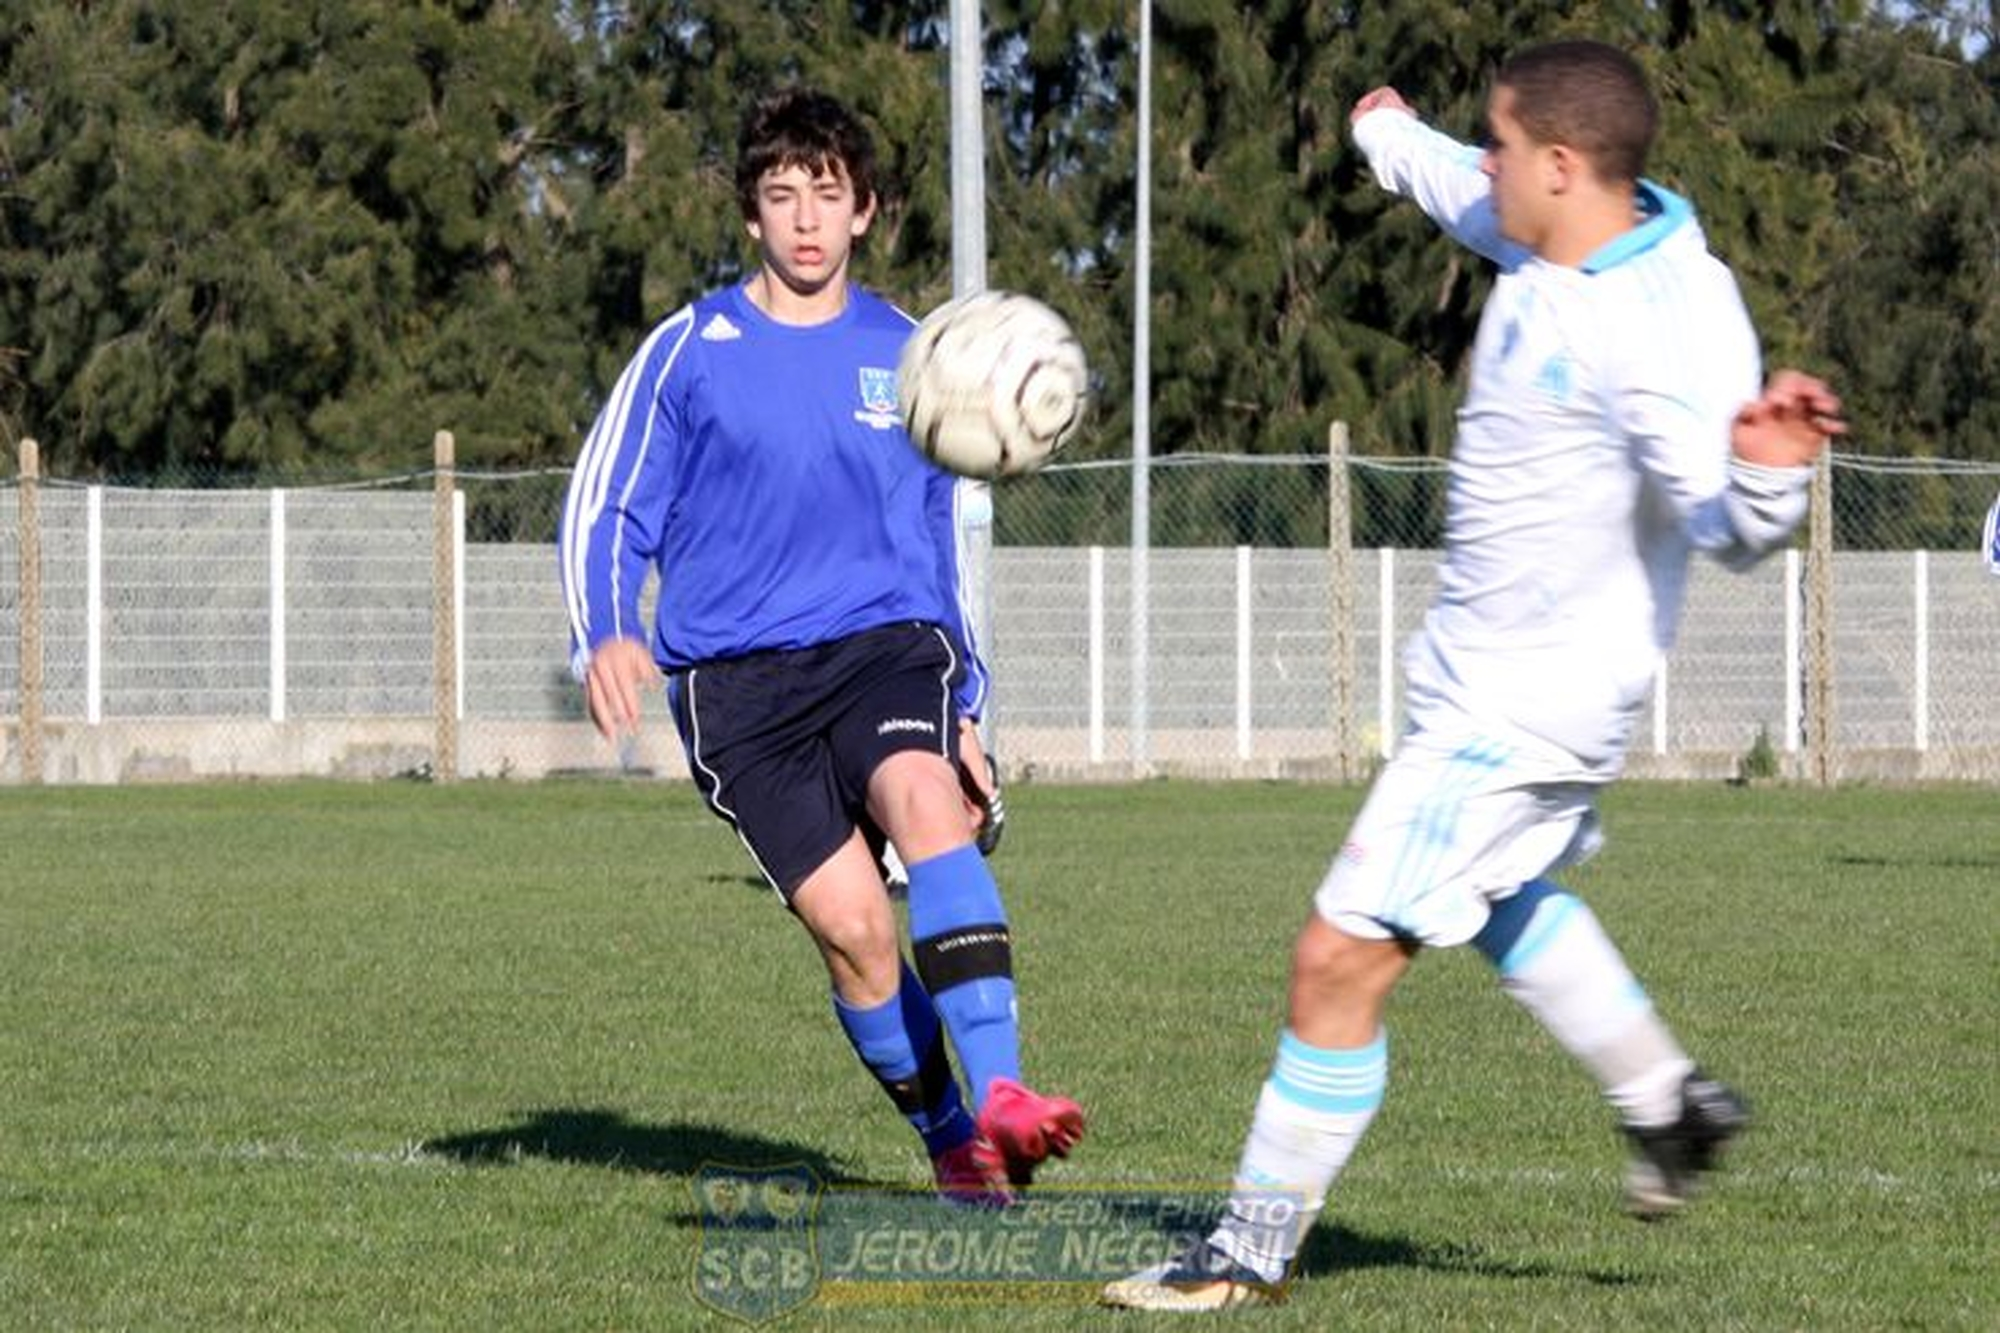 SCB/OM (14 ans Fédéraux)